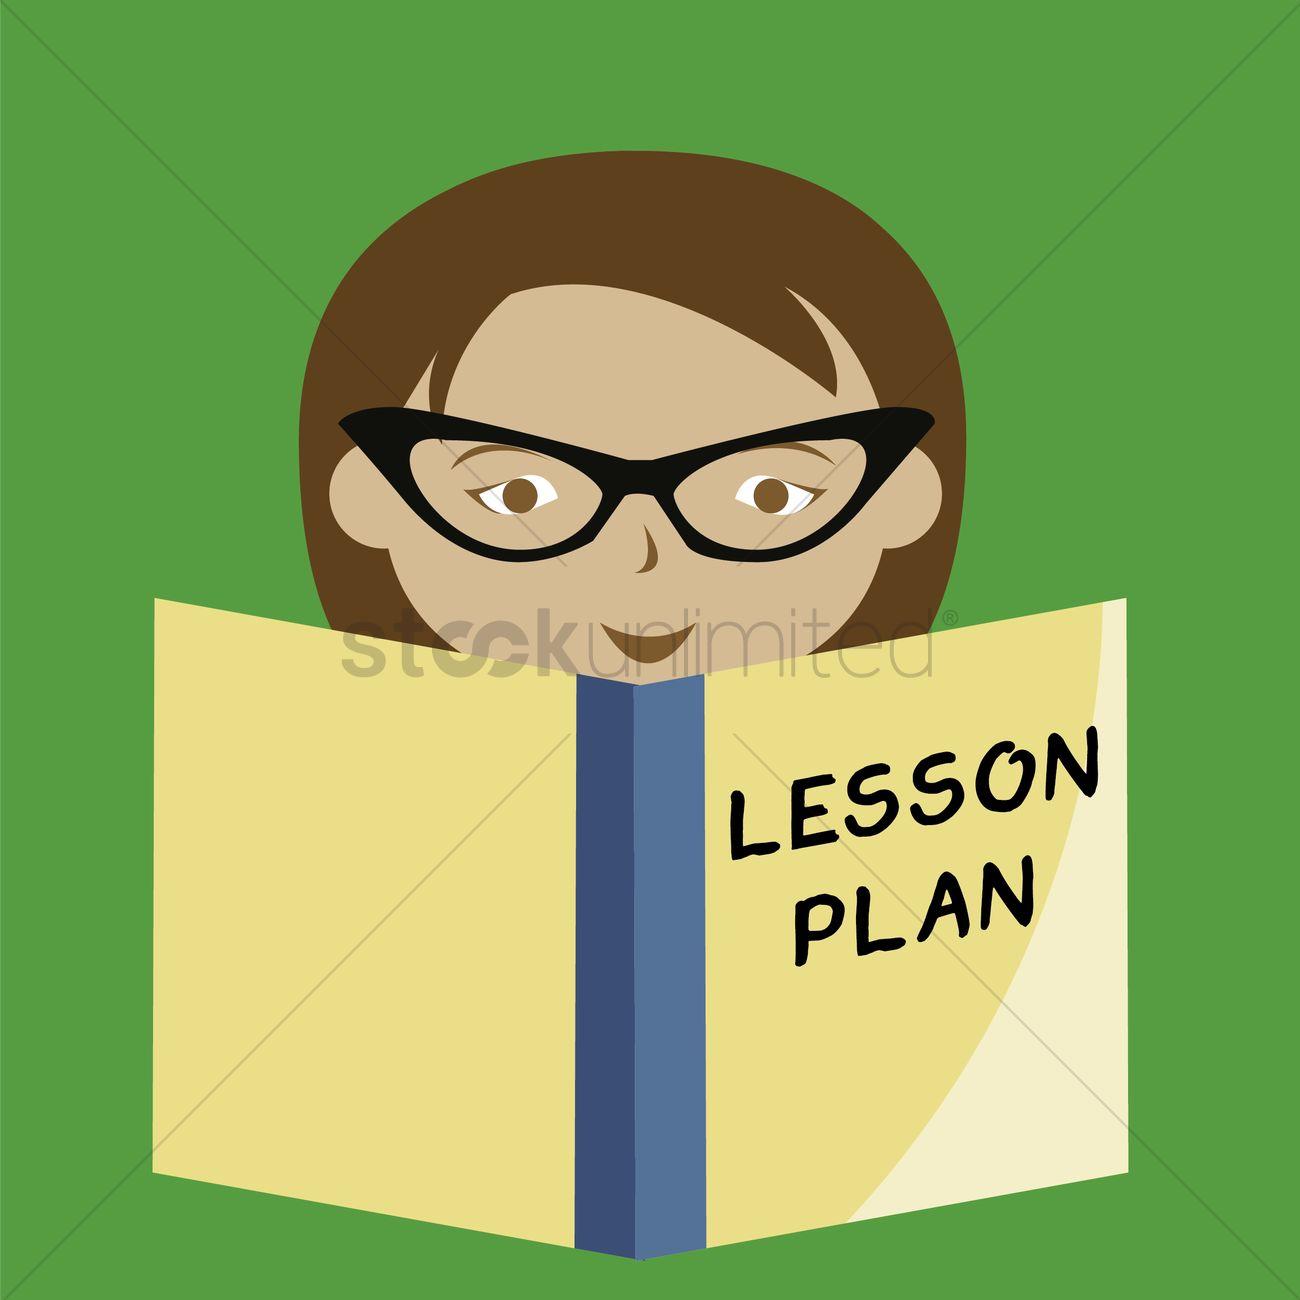 Teacher Lesson Plan Vector Graphic